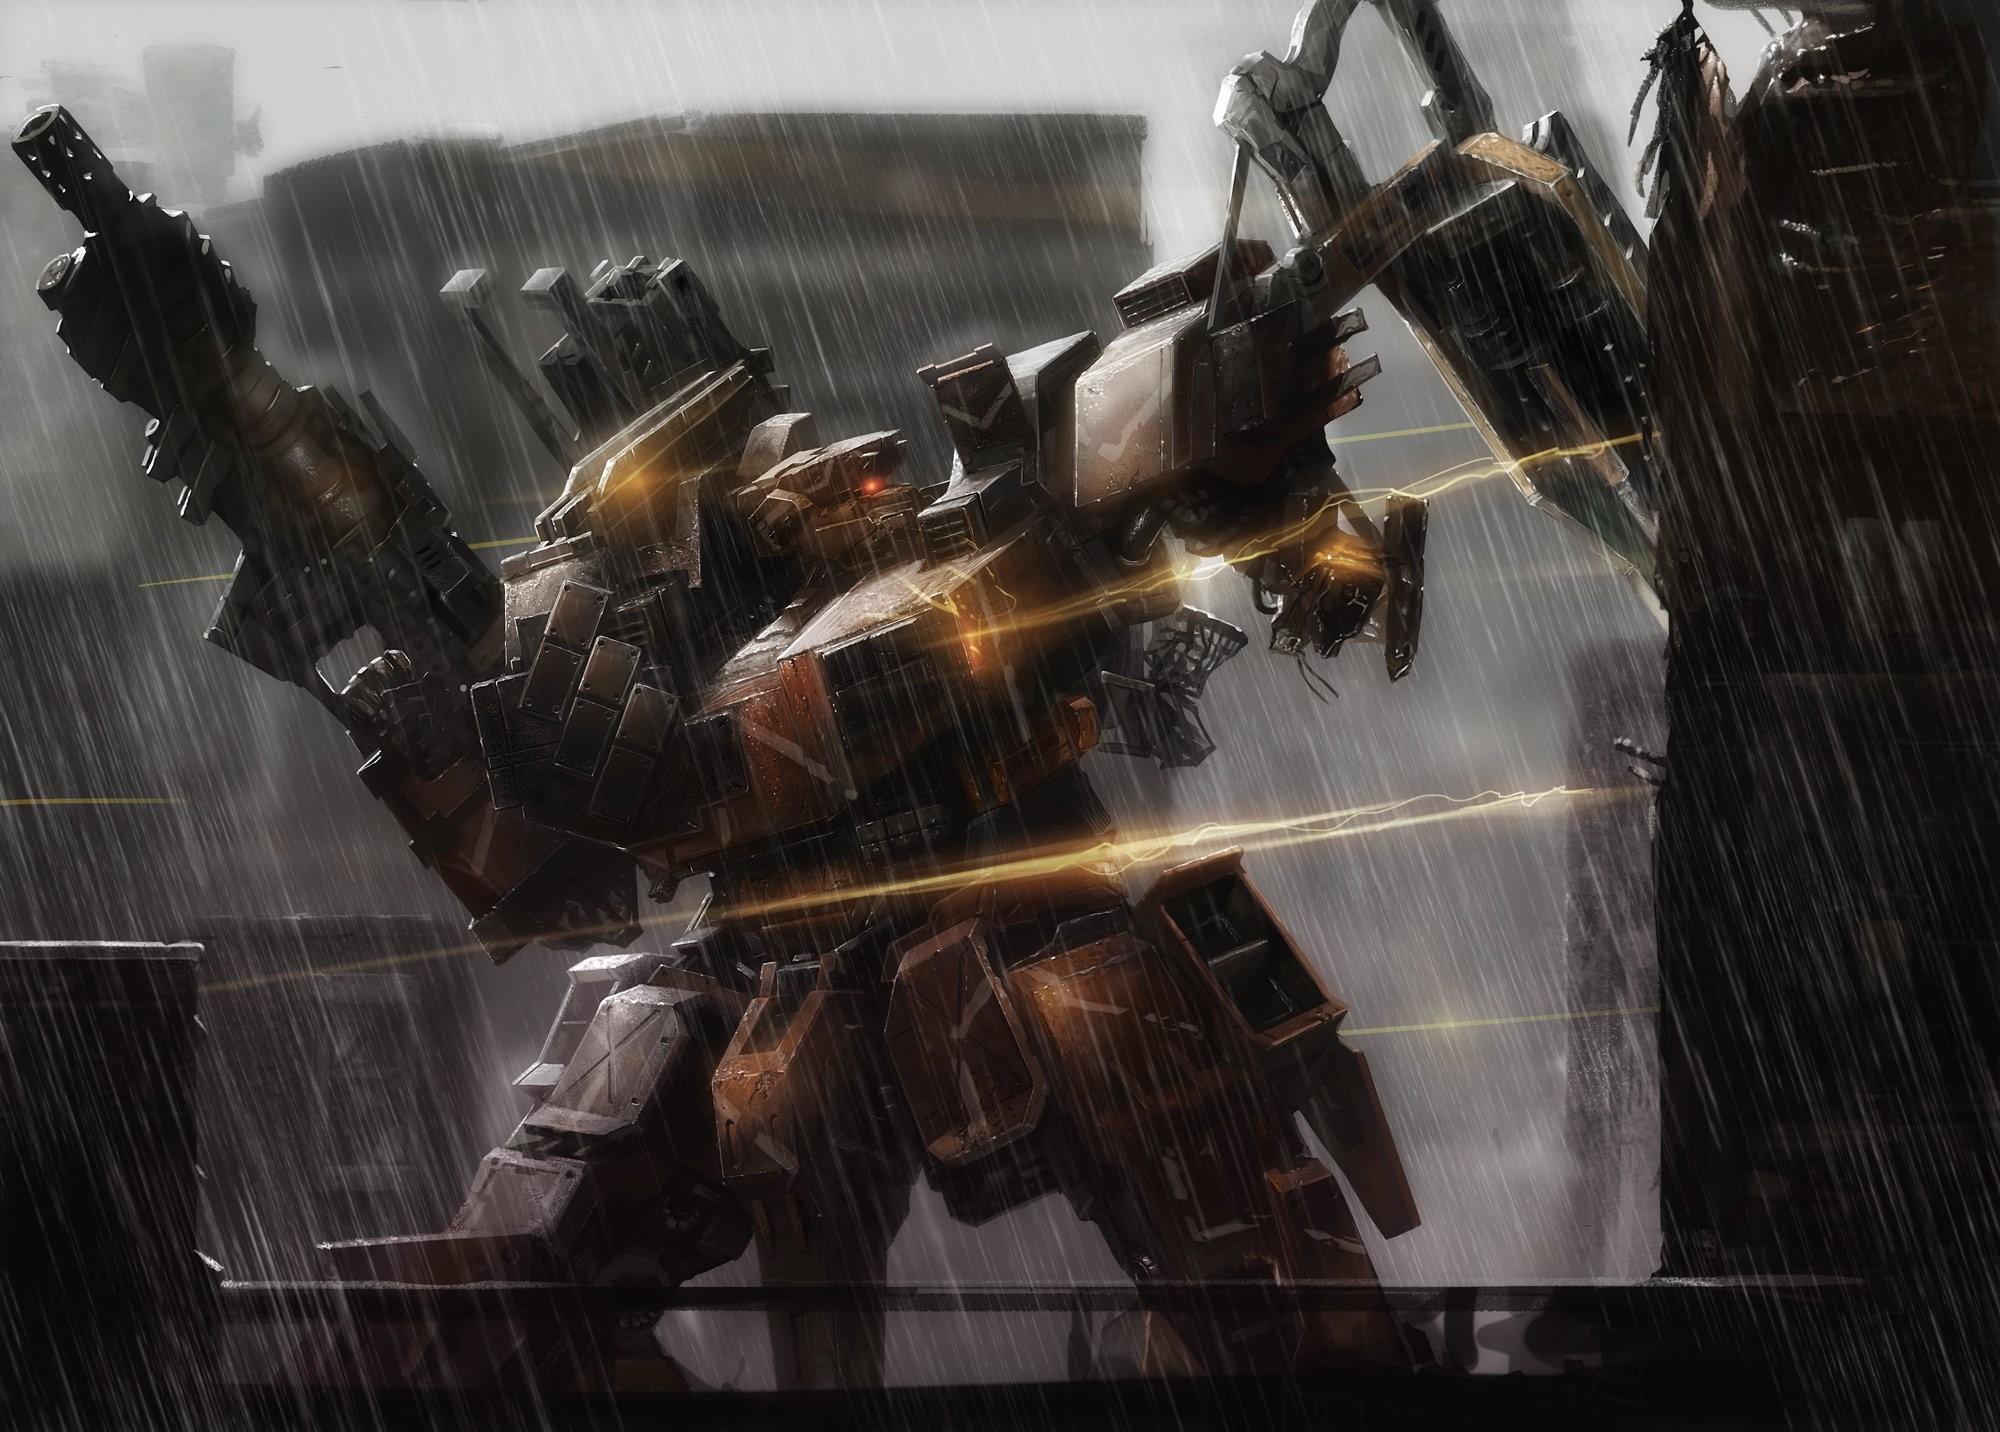 Armored core cecetiv gun mecha rain water weapon wallpaper      422829   WallpaperUP